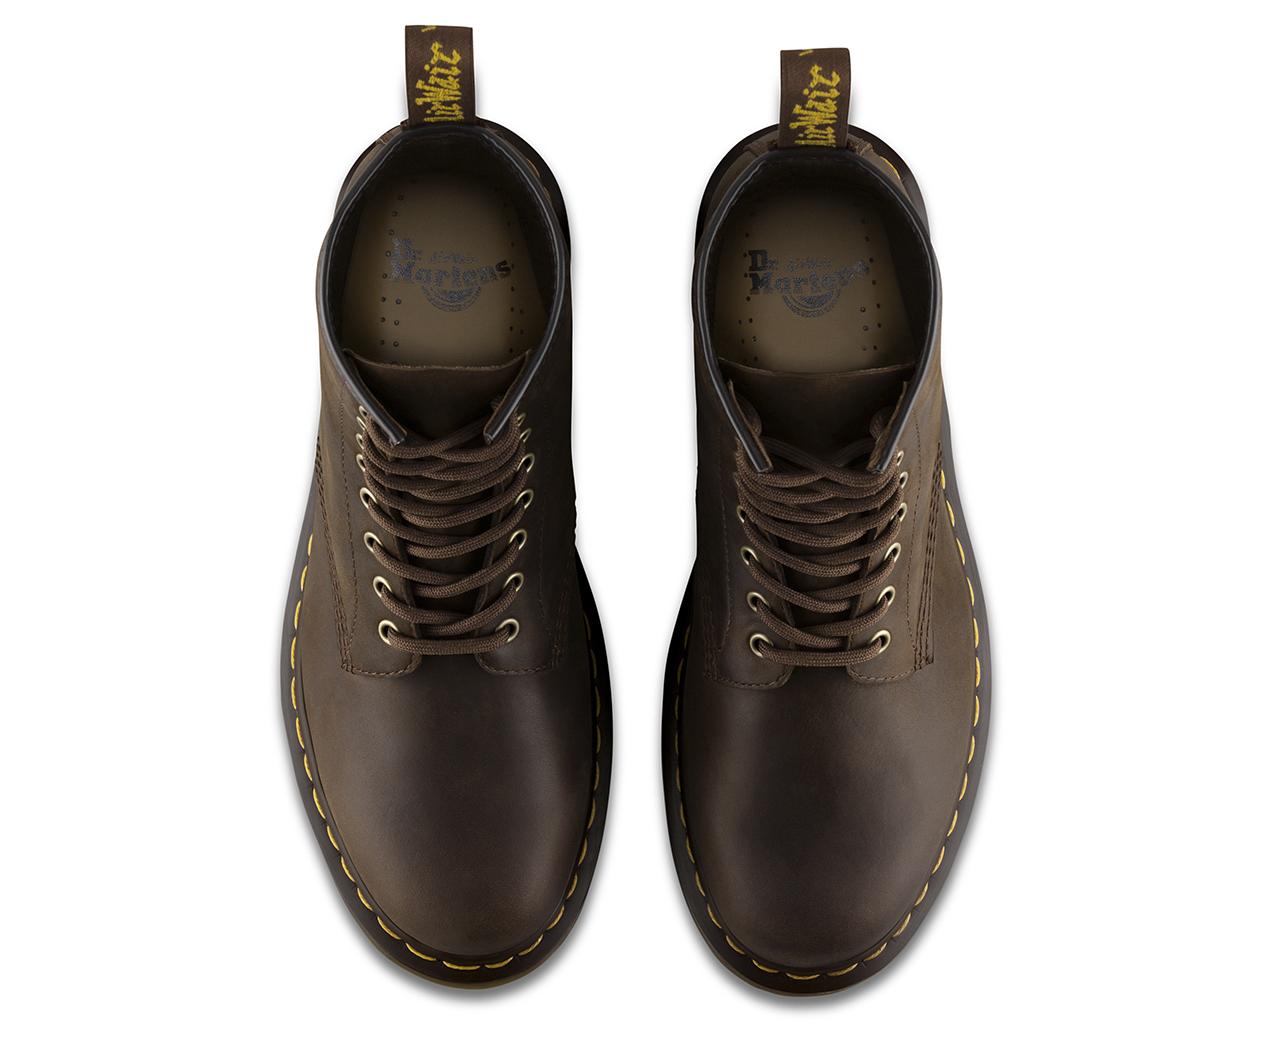 c45d13a1 1460 CRAZY HORSE | Women's Boots & Shoes | Canada